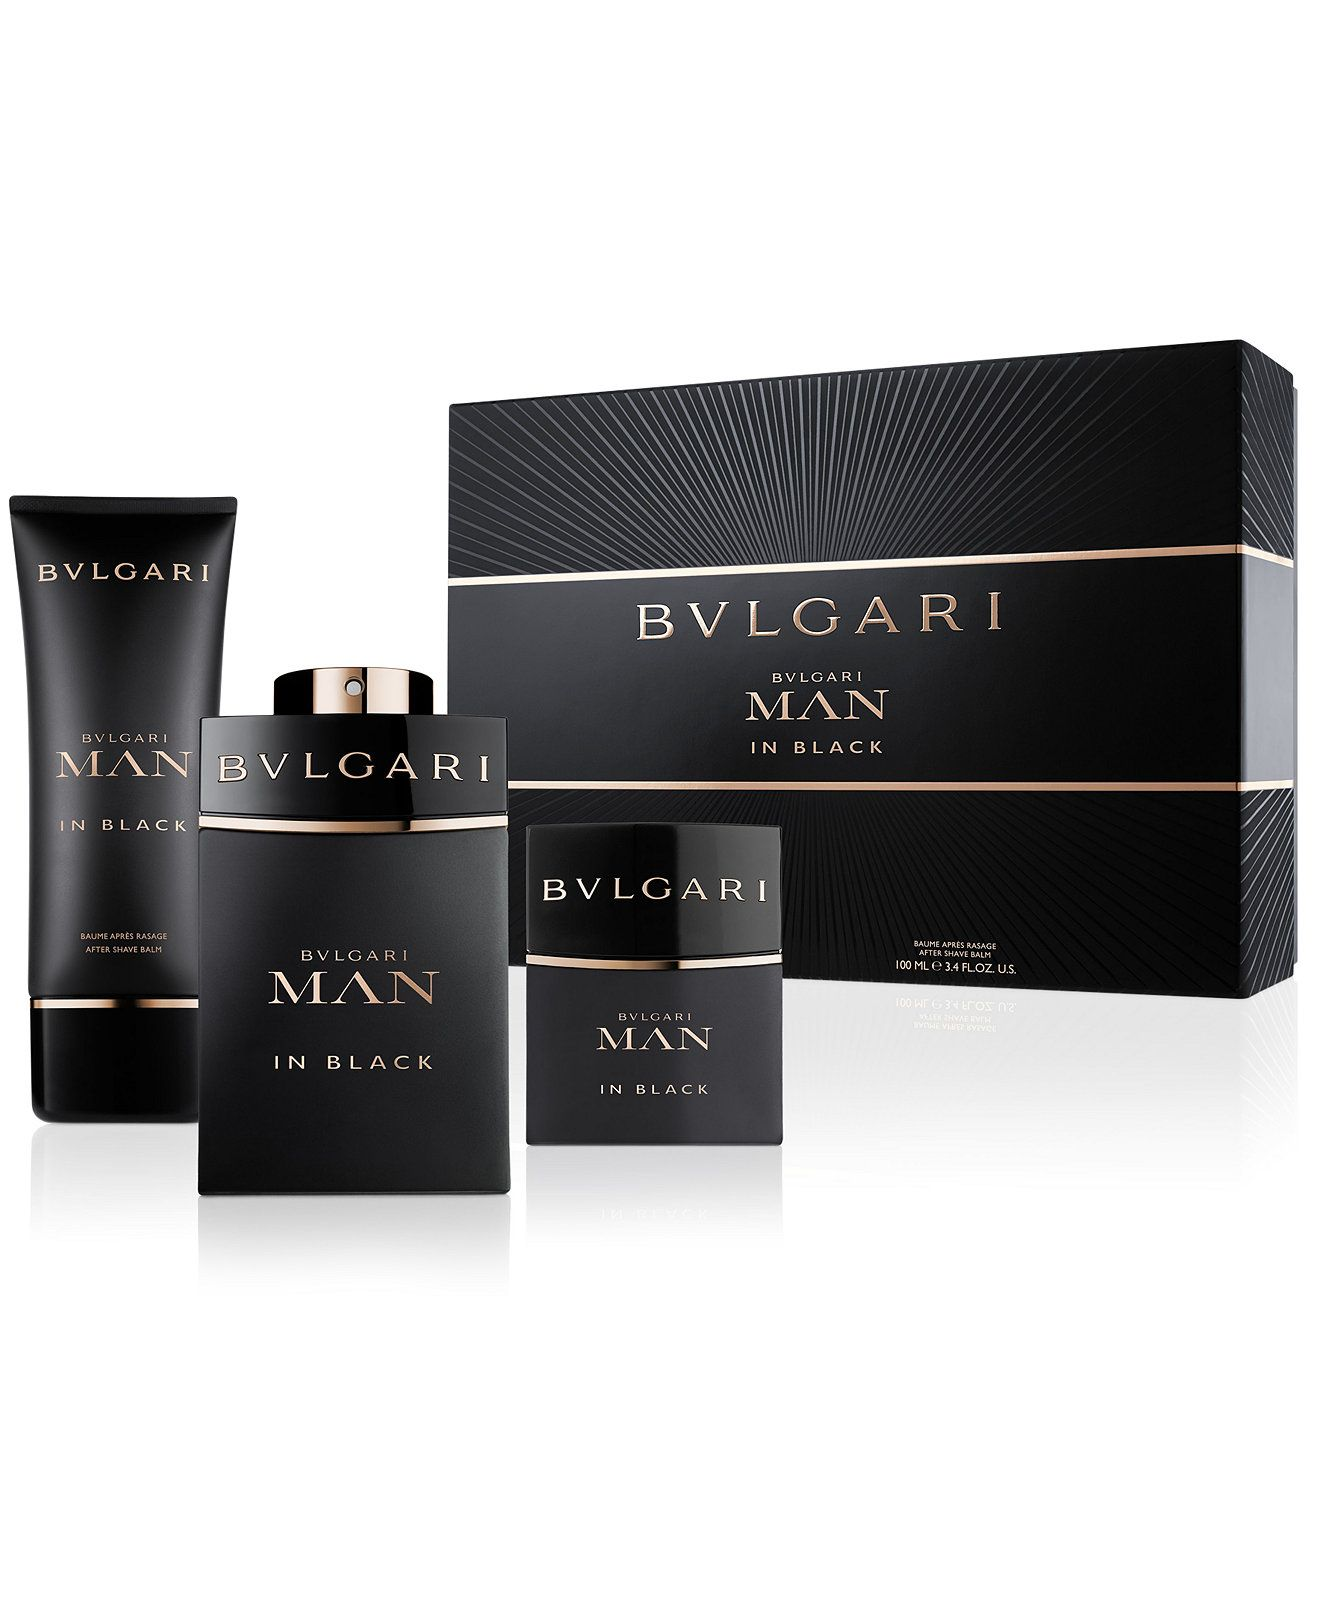 22c196a36f85 BVLGARI Man in Black Premium Gift Set - Shop All Brands - Beauty - Macy s